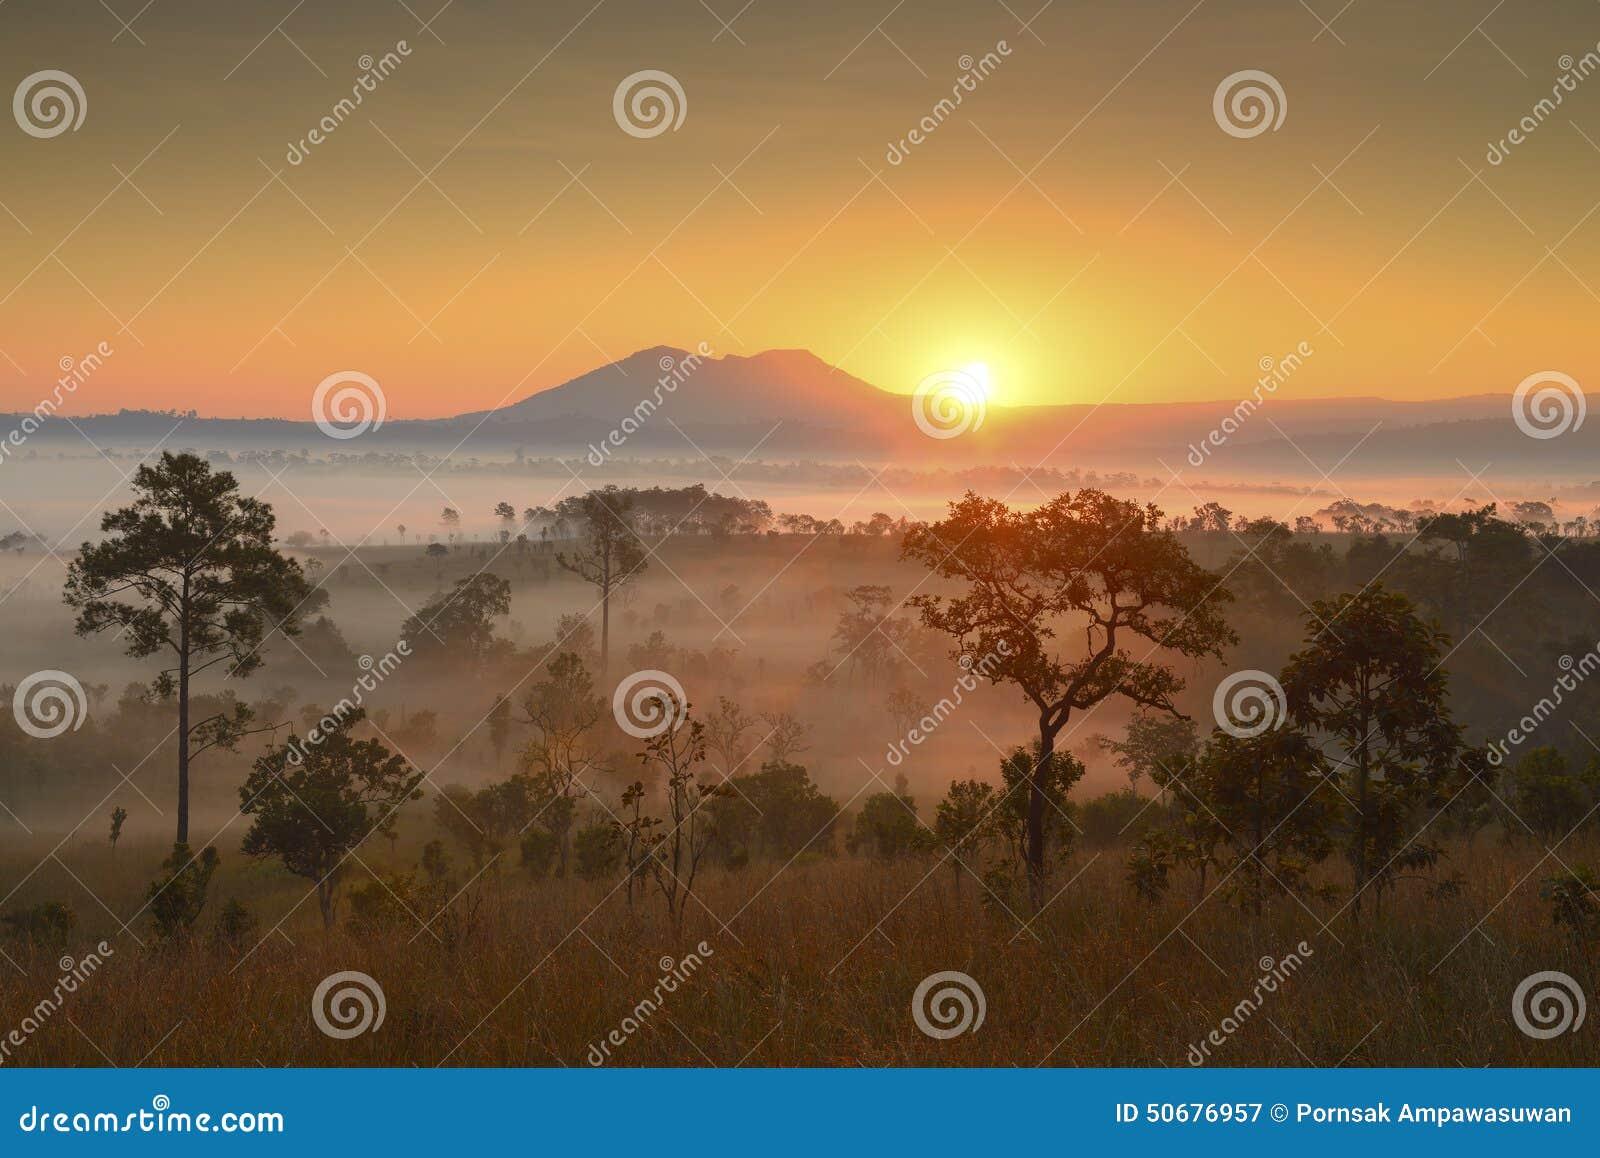 Download 美好的新观点桐树萨朗Luang,泰国 库存图片. 图片 包括有 风景, 森林, 本质, 地产, 季节, 绿色 - 50676957